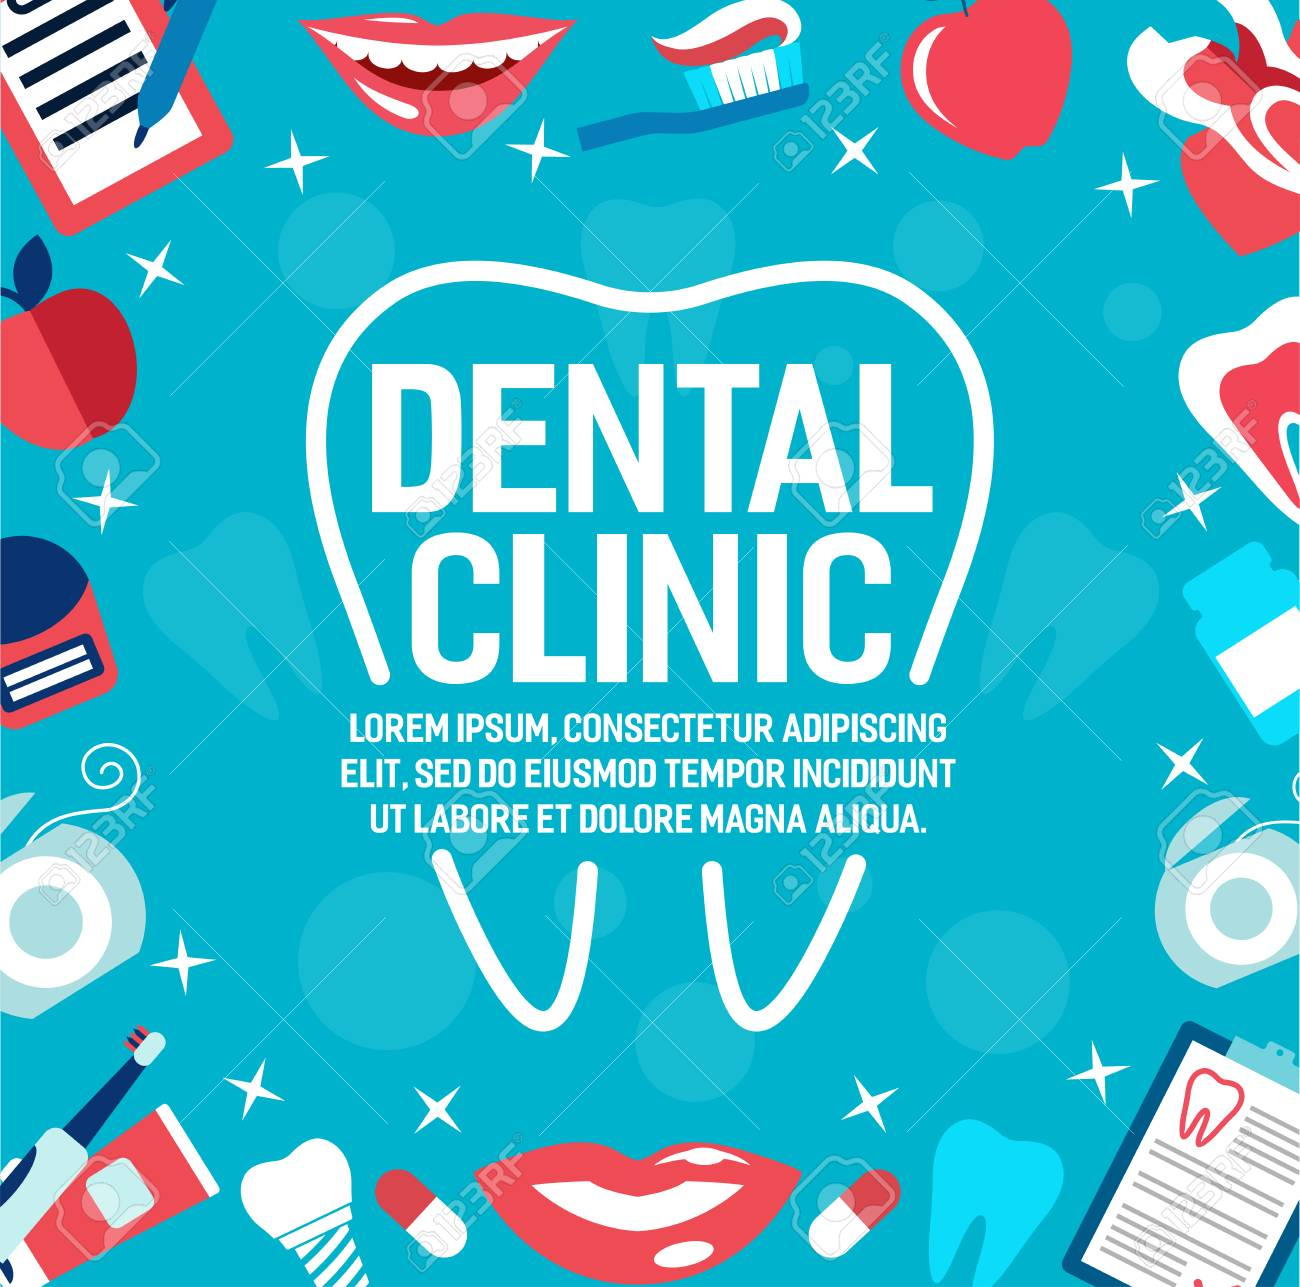 Dental clinic poster for dentistry medicine or dental healthcare